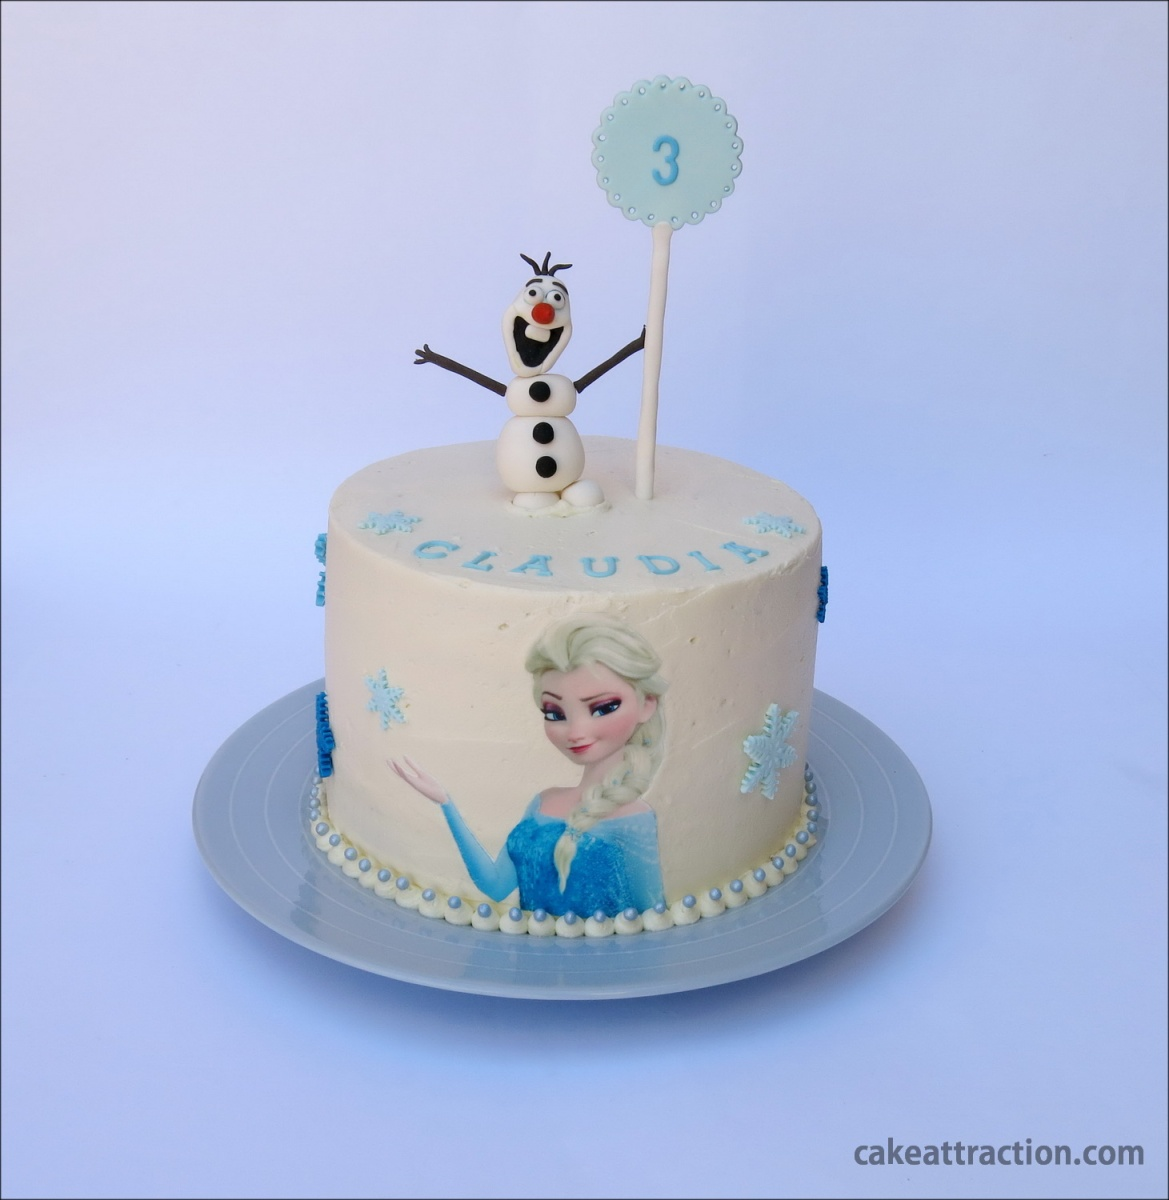 Tarta Frozen (Princesa Disney Elsa y Olaf)